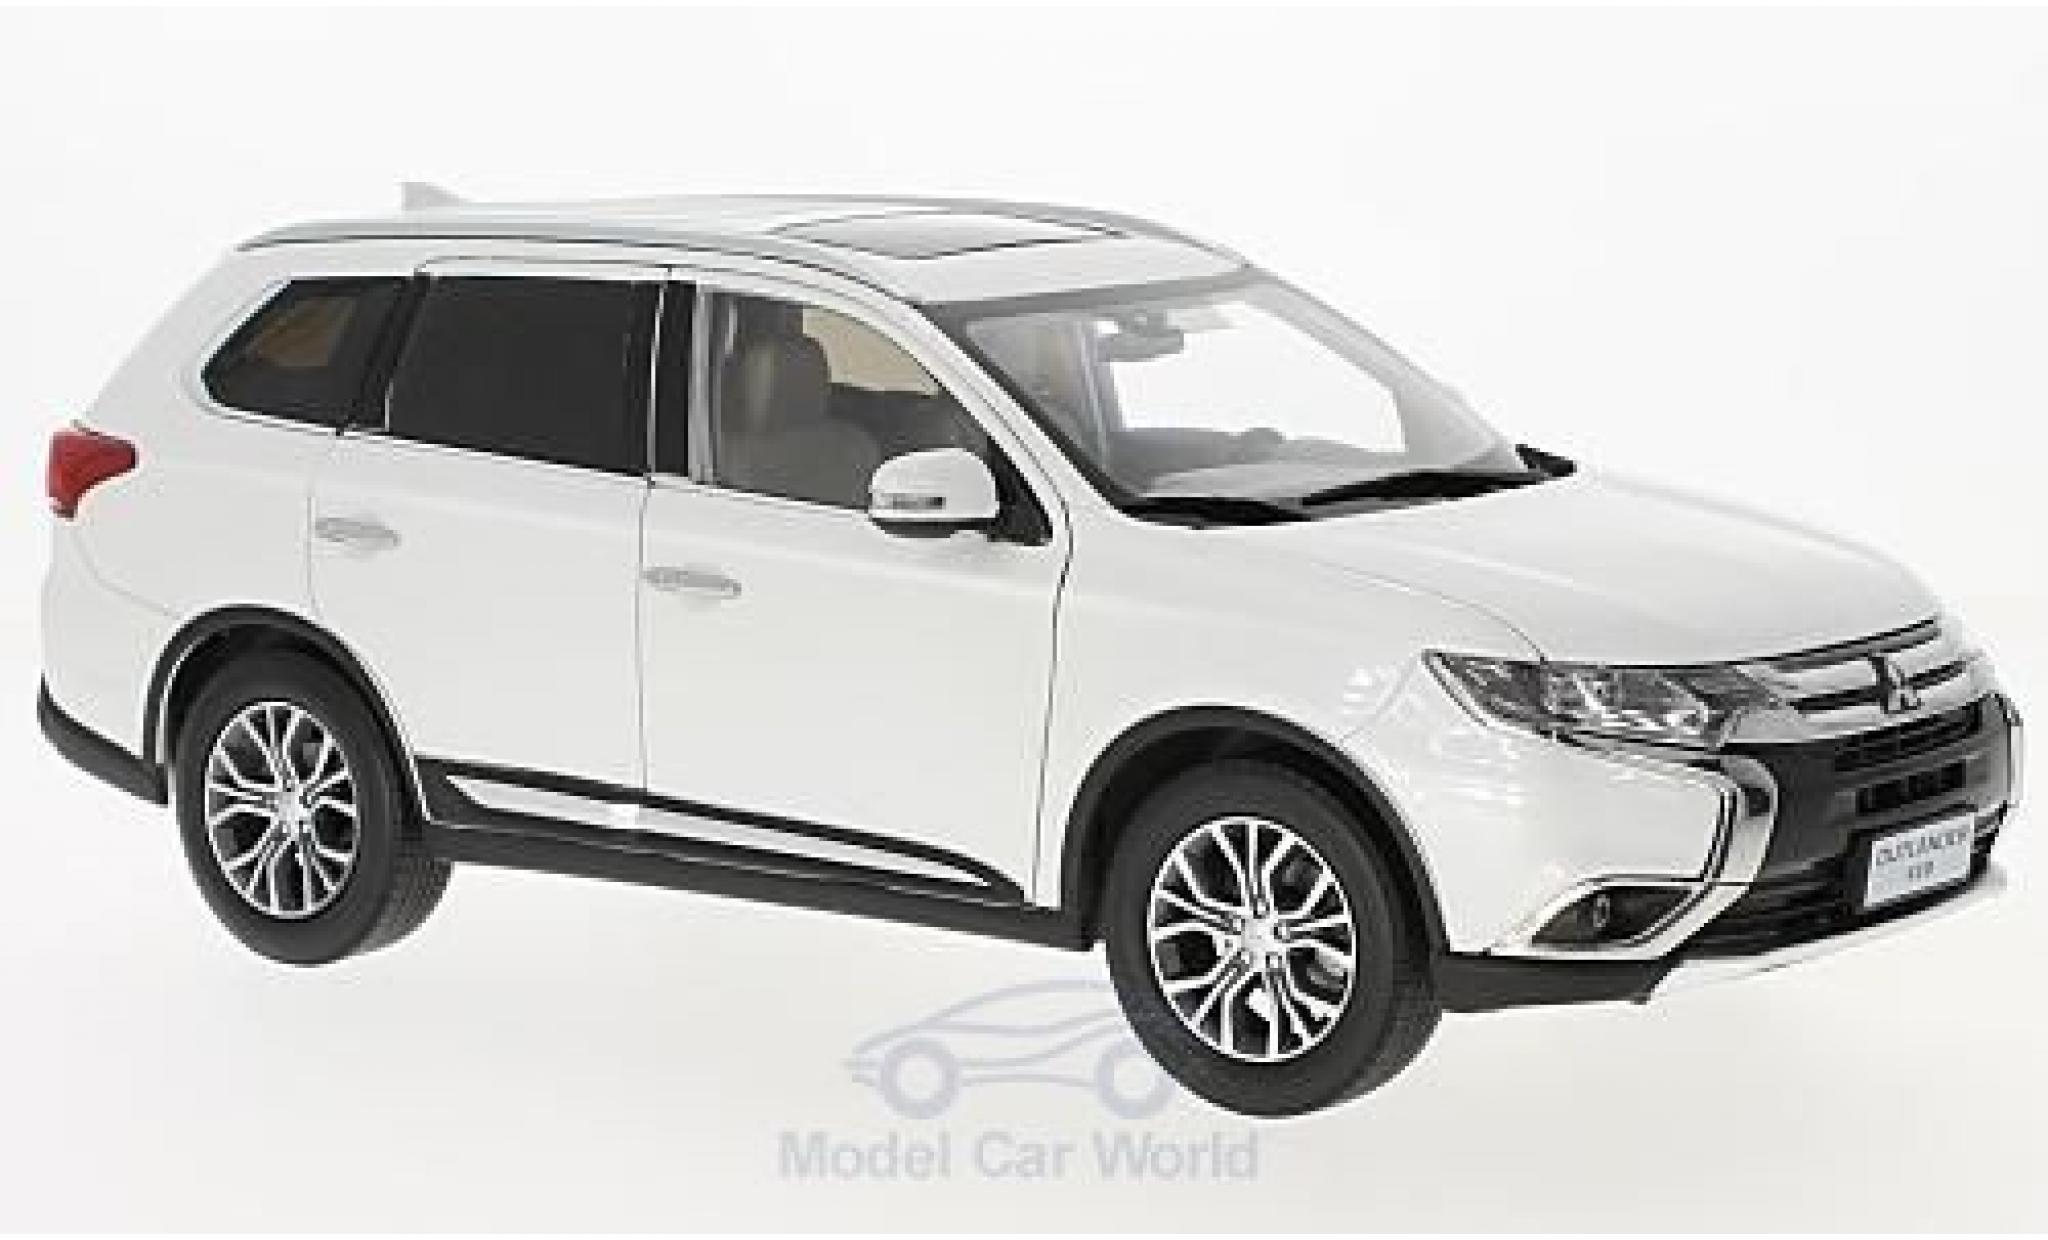 mitsubishi outlander 1 18 paudi blanche 2016 voiture. Black Bedroom Furniture Sets. Home Design Ideas